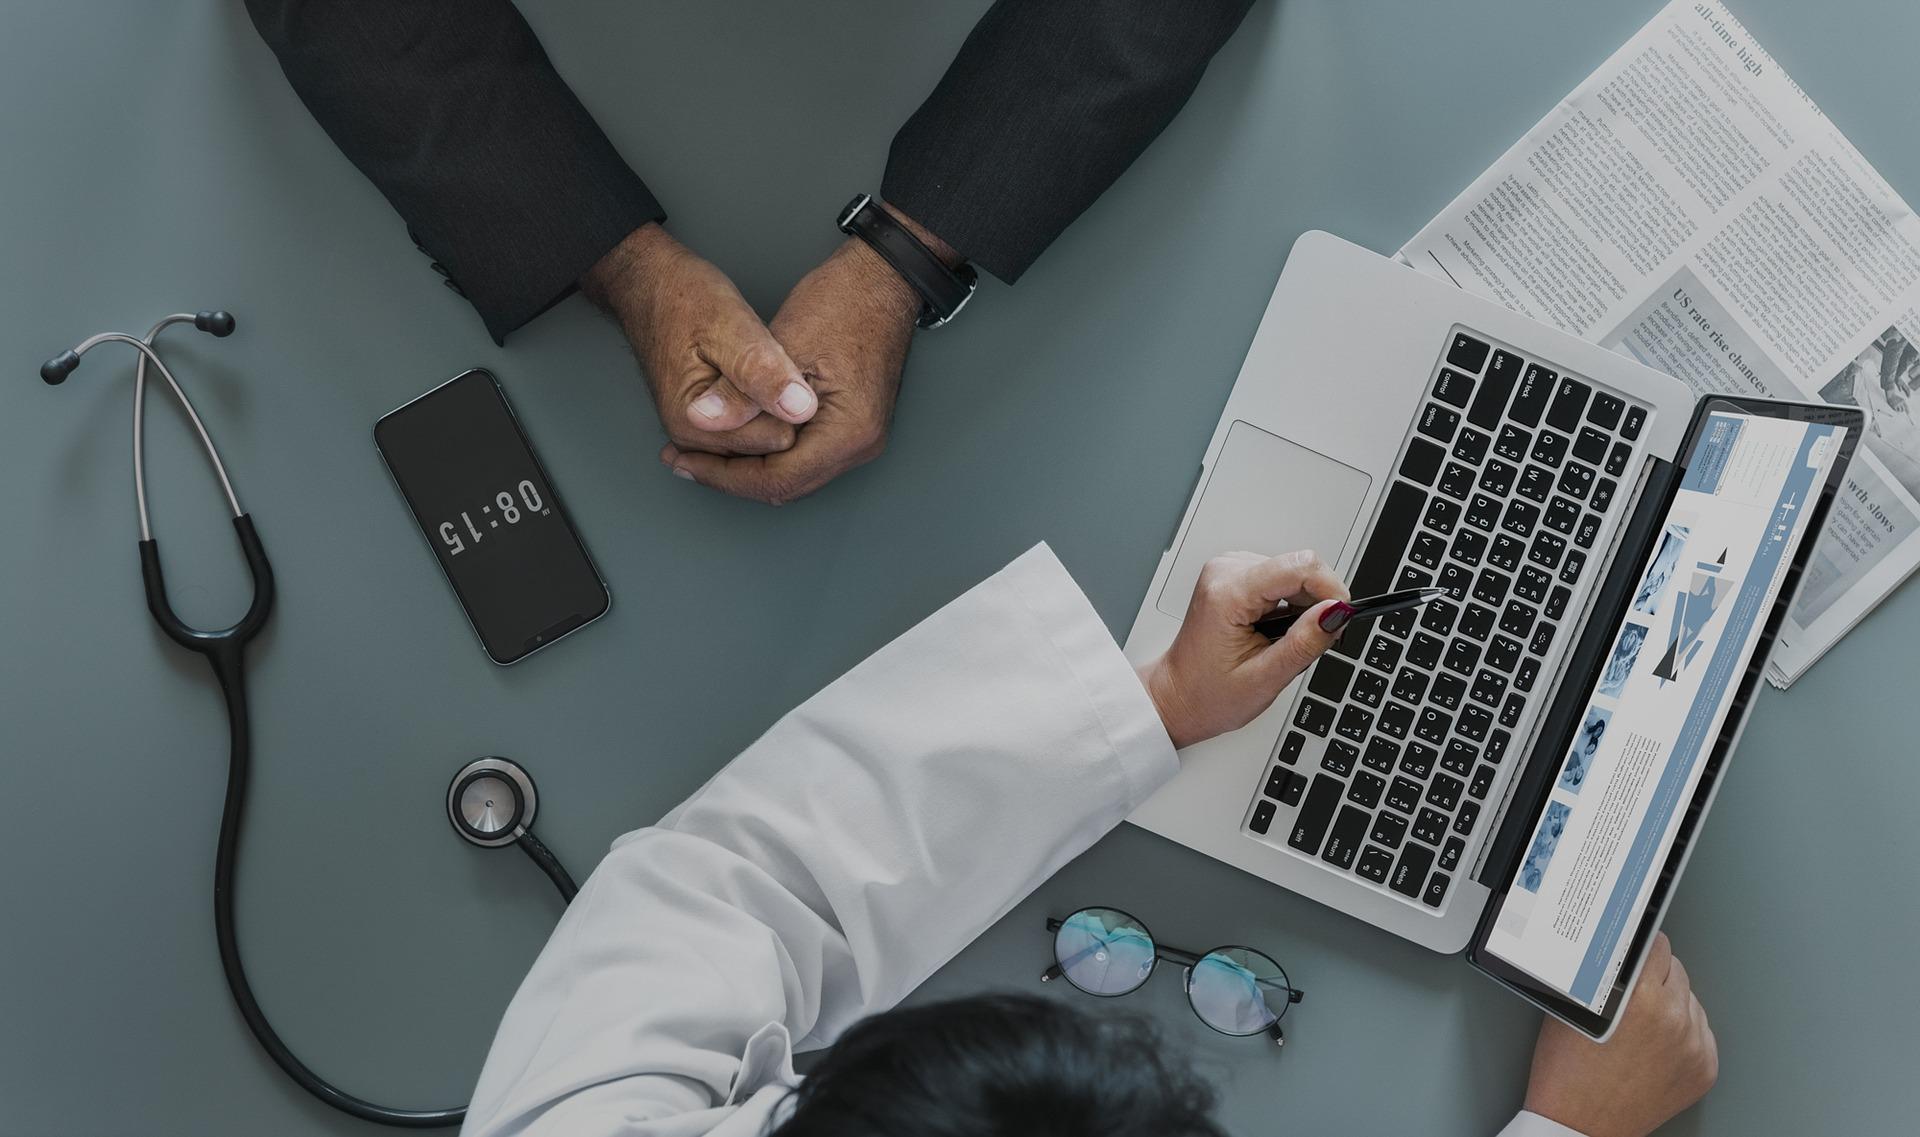 fiercebiotech.com - Amgen to consolidate its digital patient engagement systems under Deloitte banner